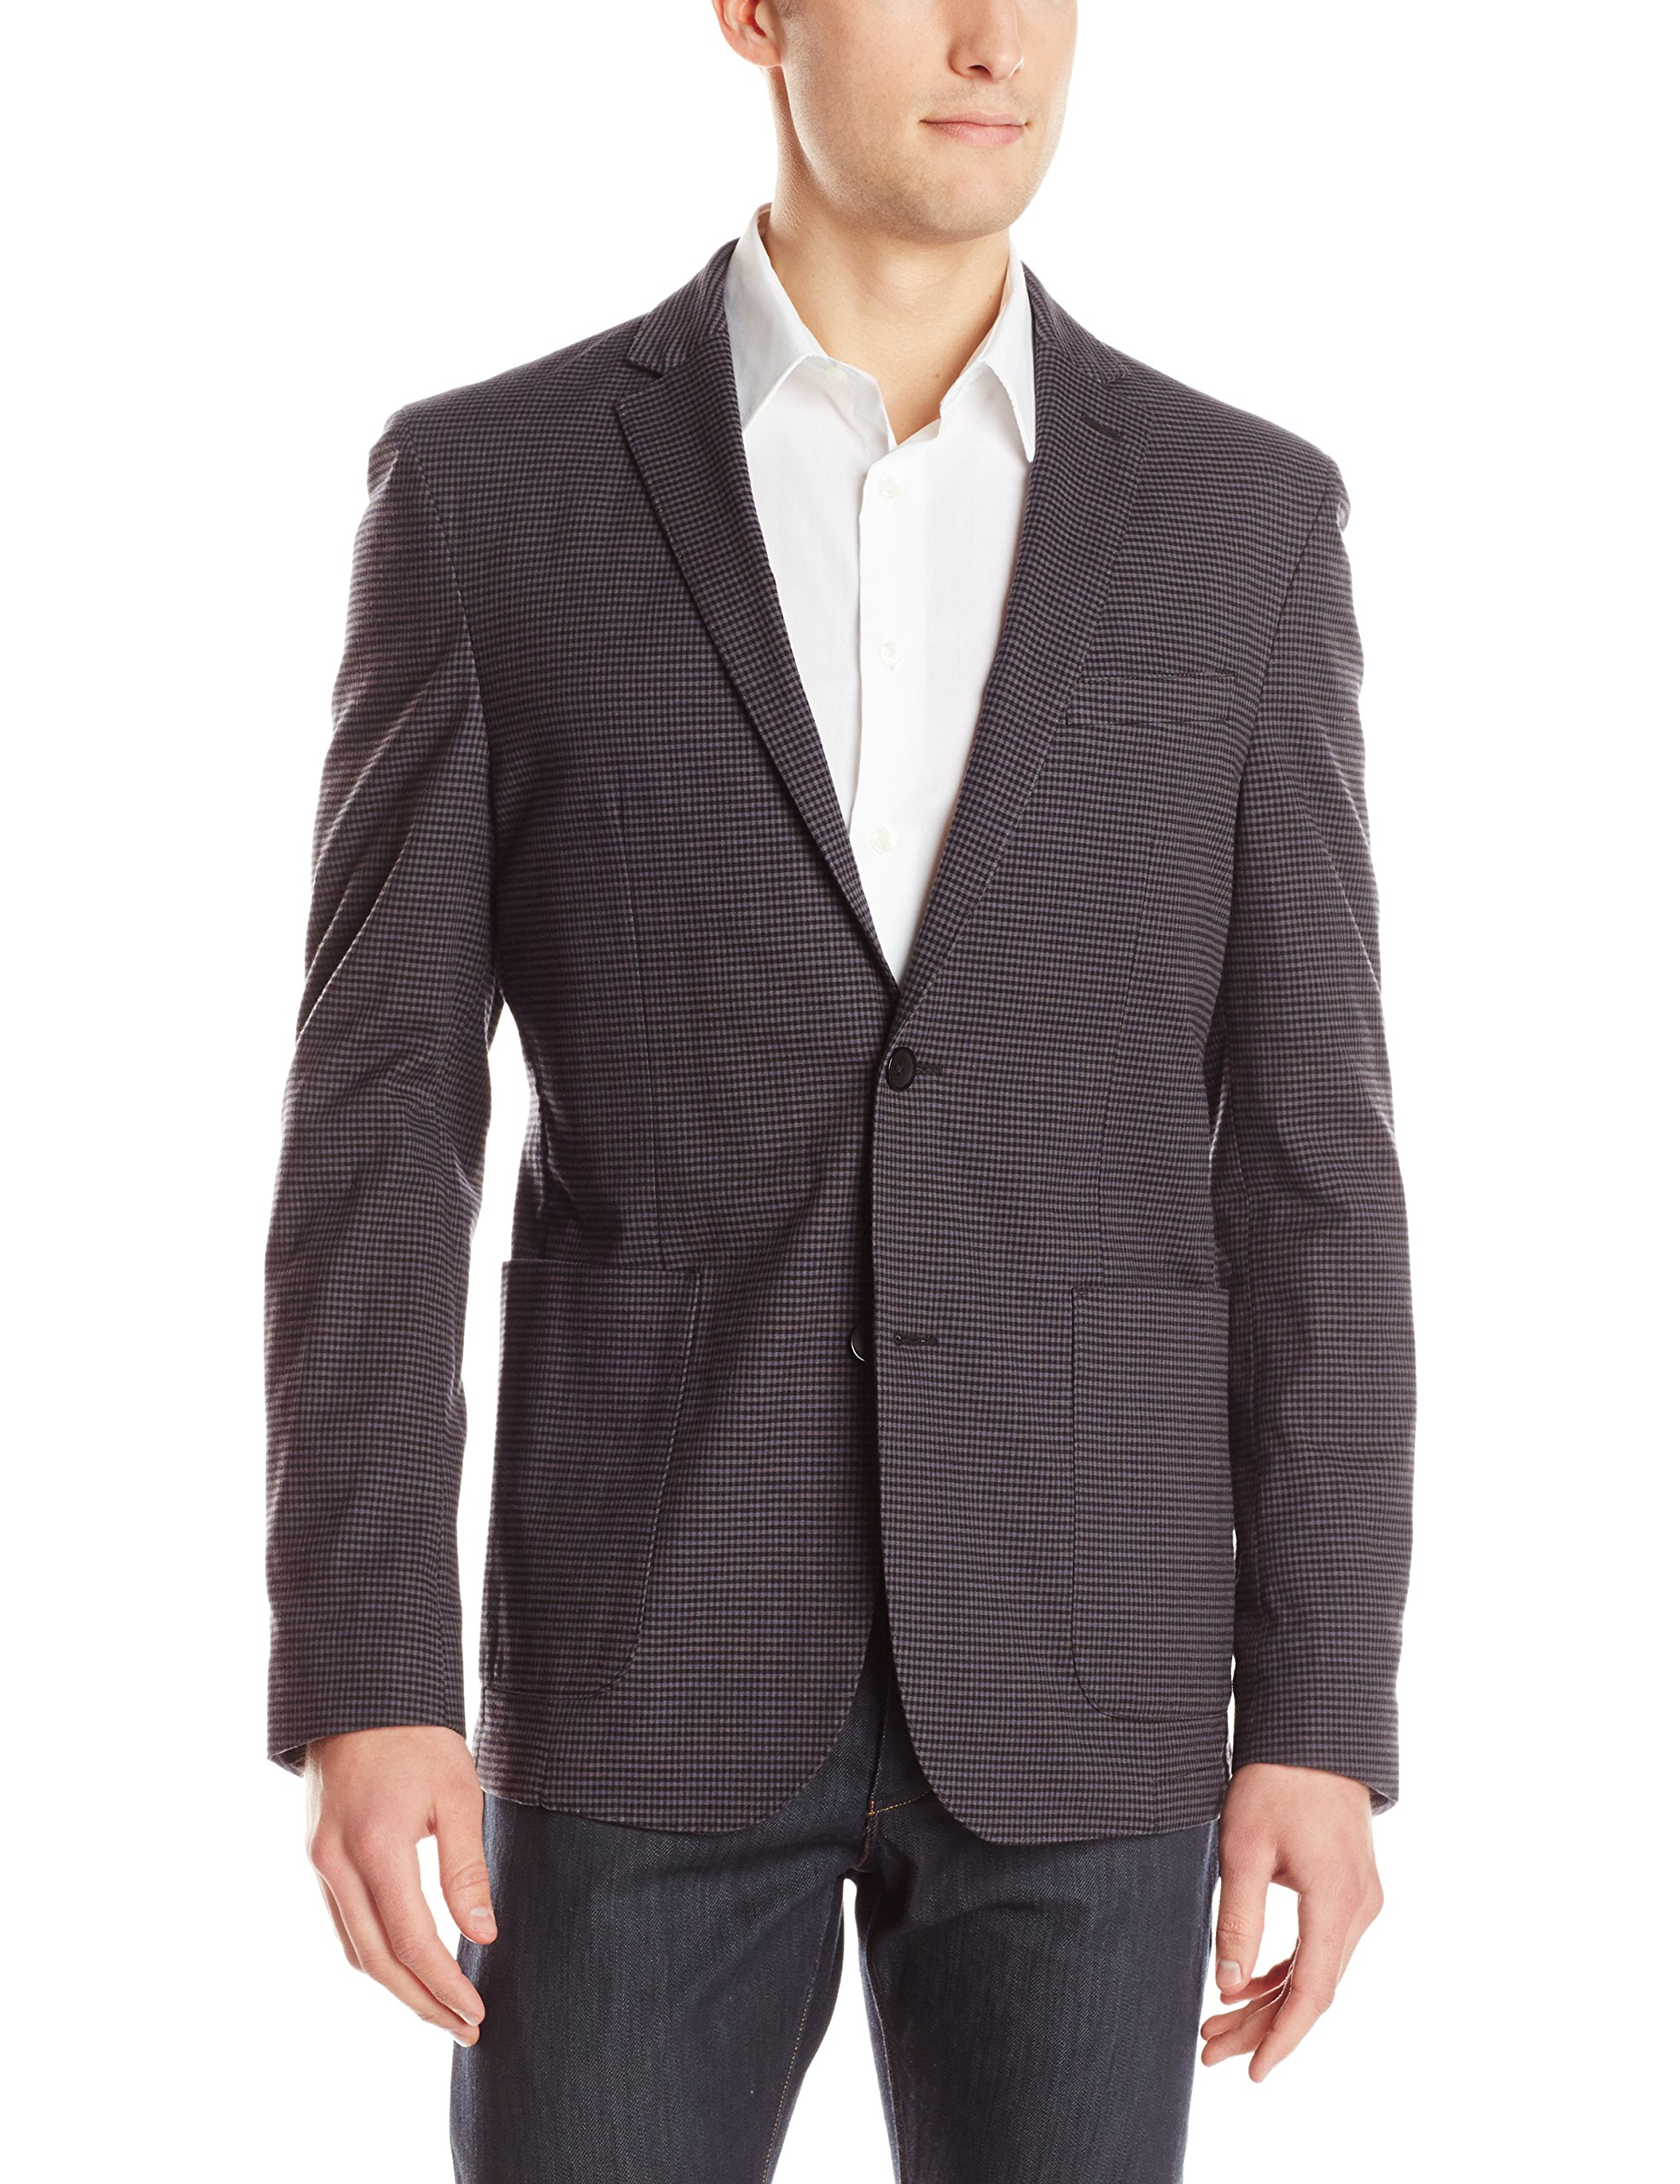 Vince Camuto Men's Air Jacket, Charcoal/Black Fine Gingham Check, 40/Medium